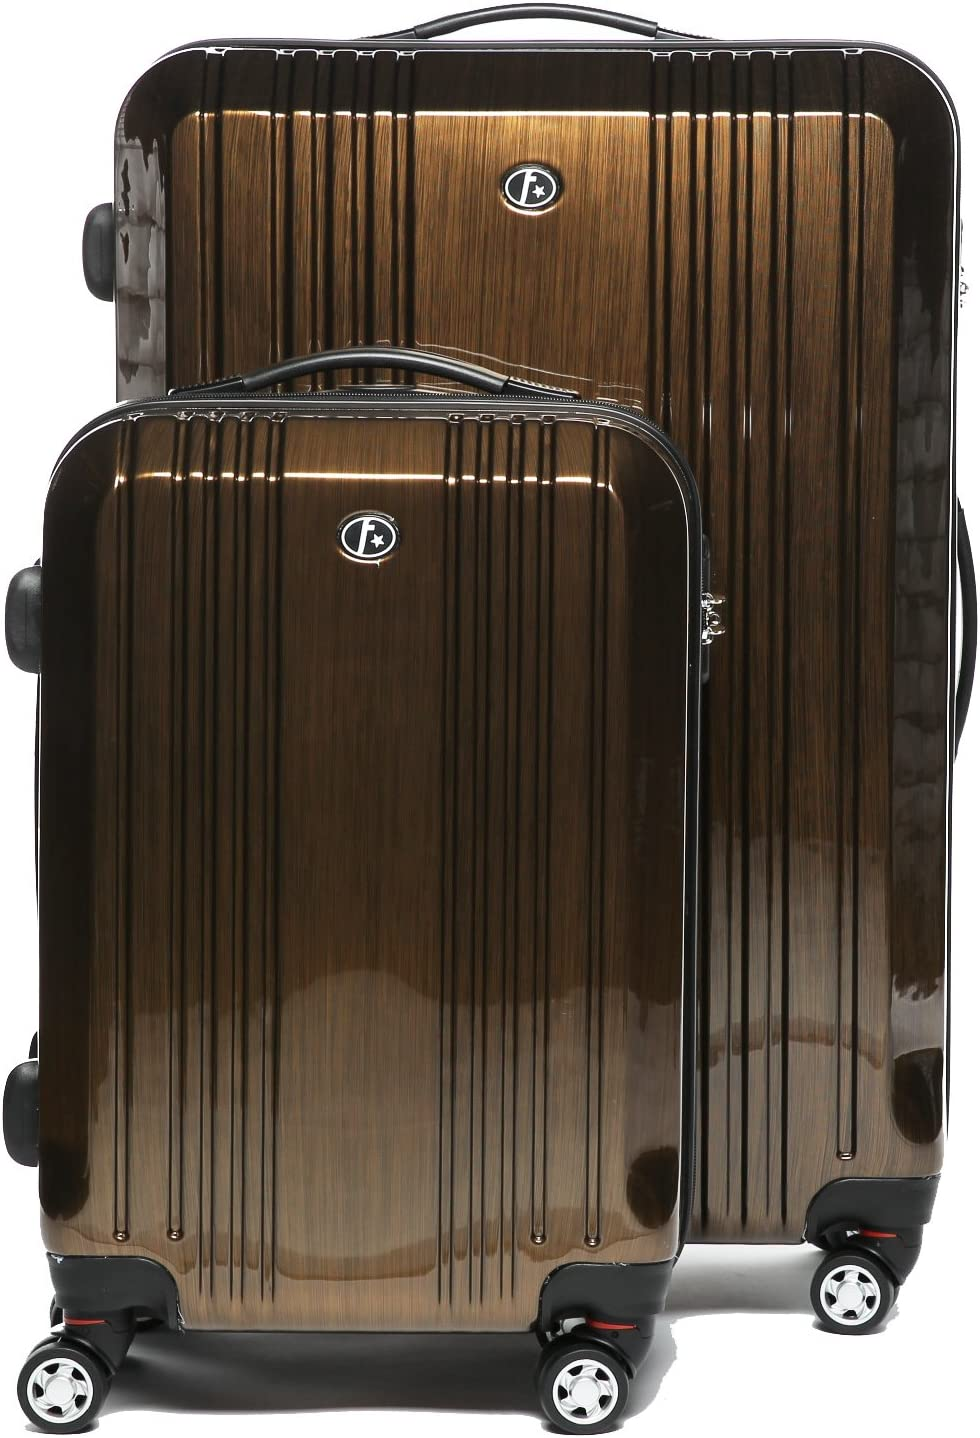 FERGÉ Juego 2 Maletas rígidas de Viaje Cannes Maleta Cabina 55 cm Maleta Grande Equipaje 2 Piezas con 4 Ruedas giratorias marrón